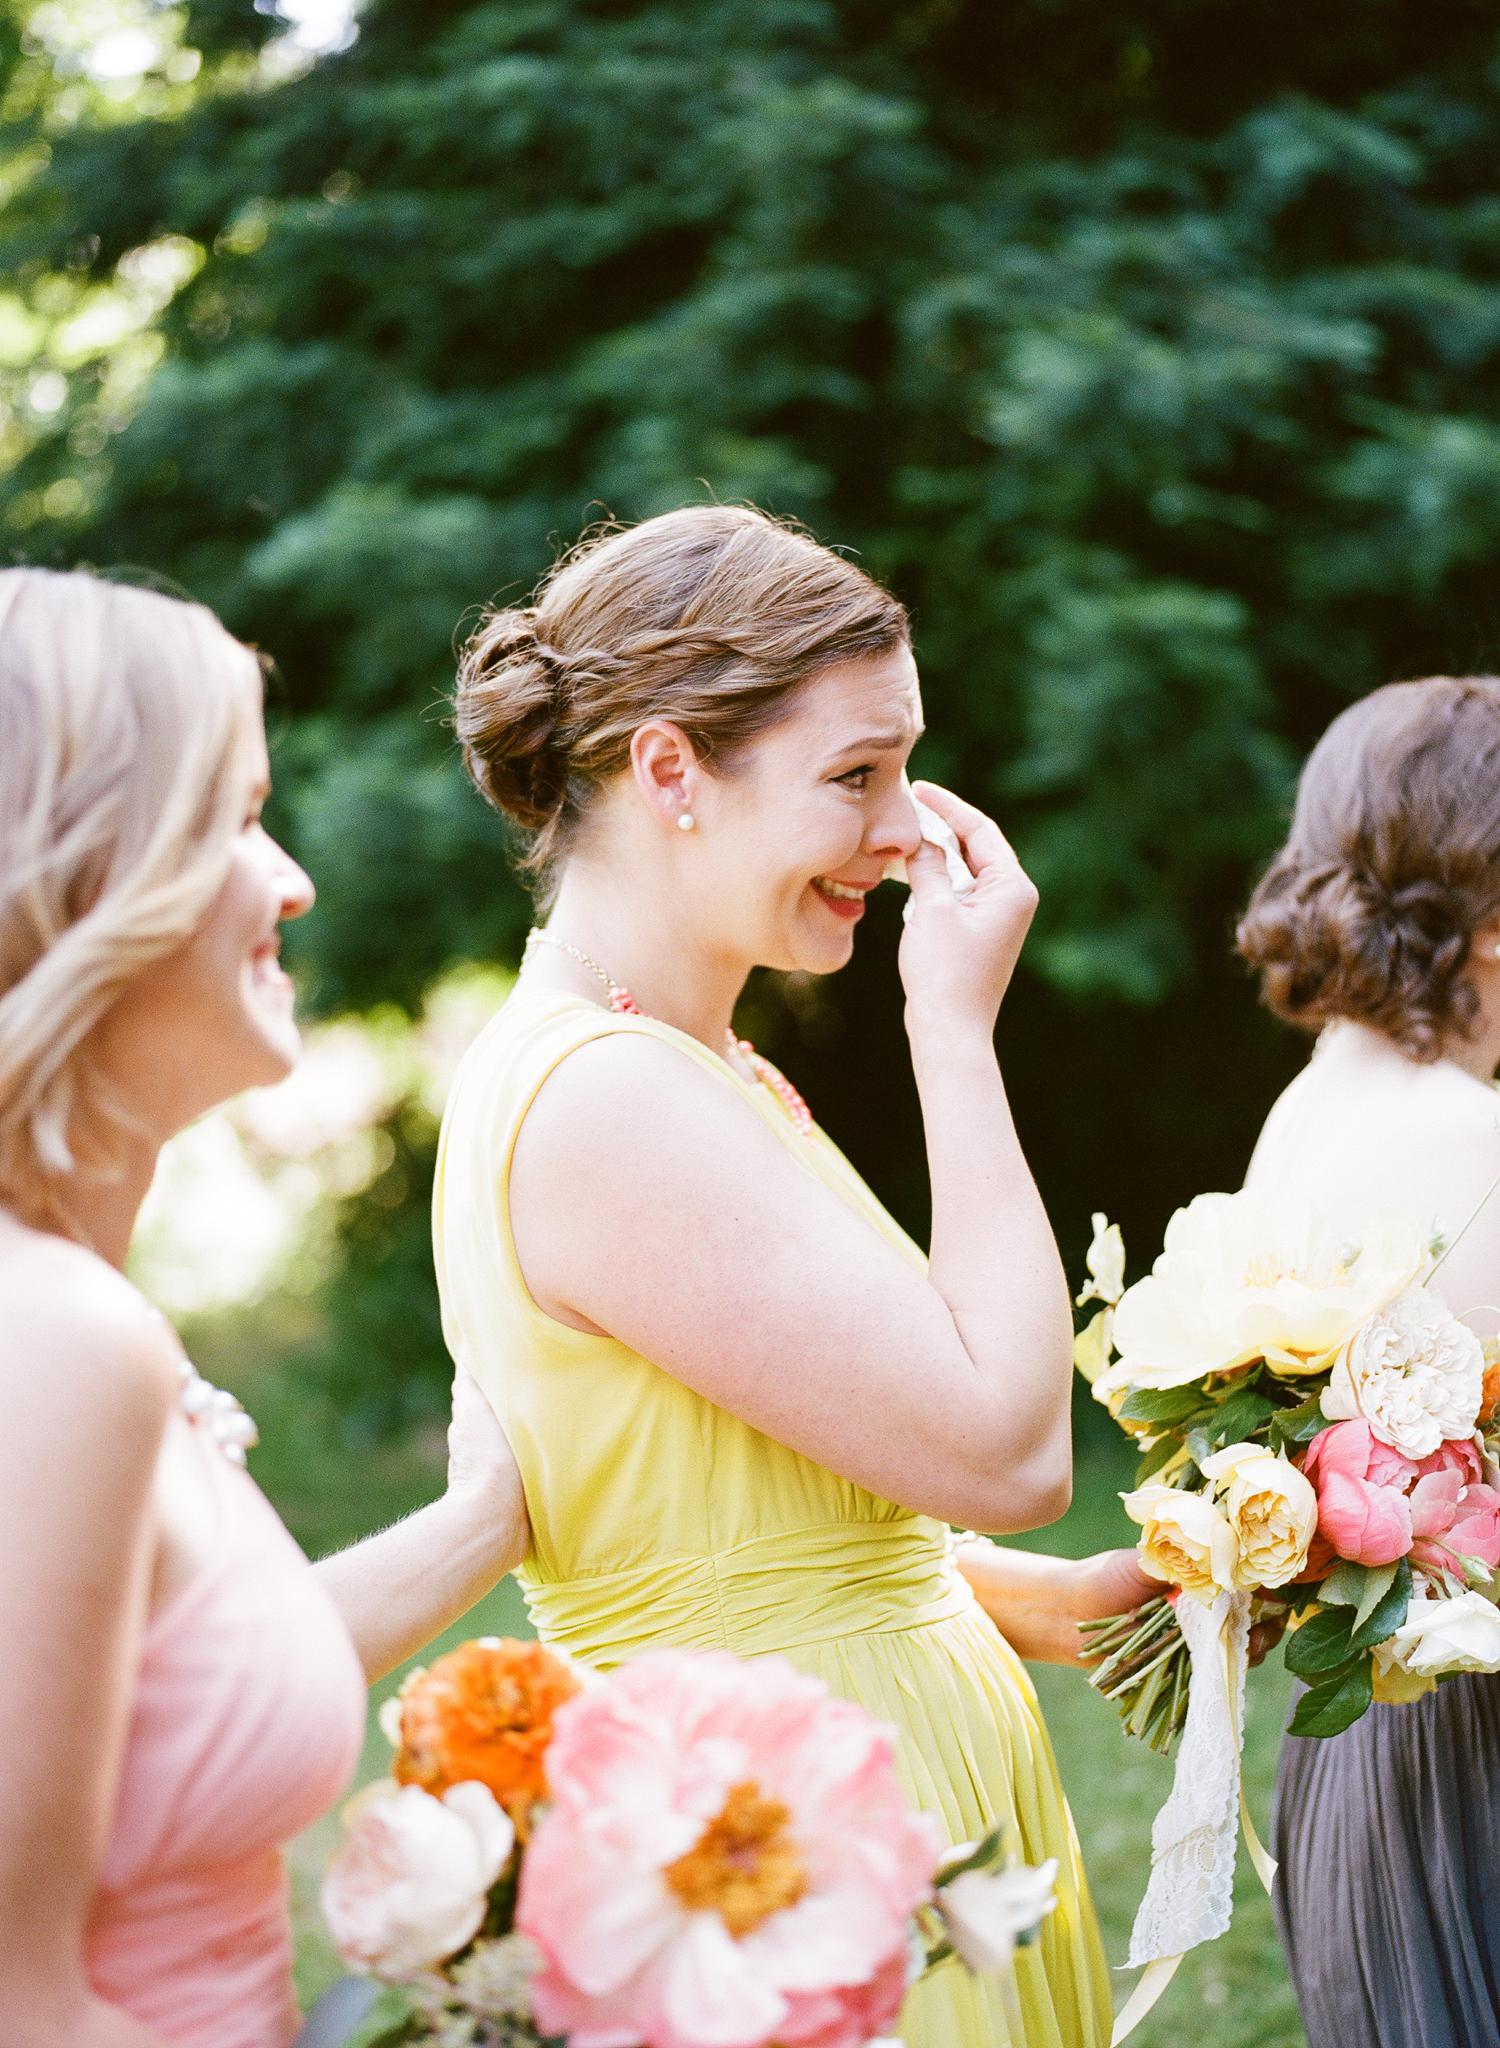 21-yellow-bridesmaid-dress.jpg